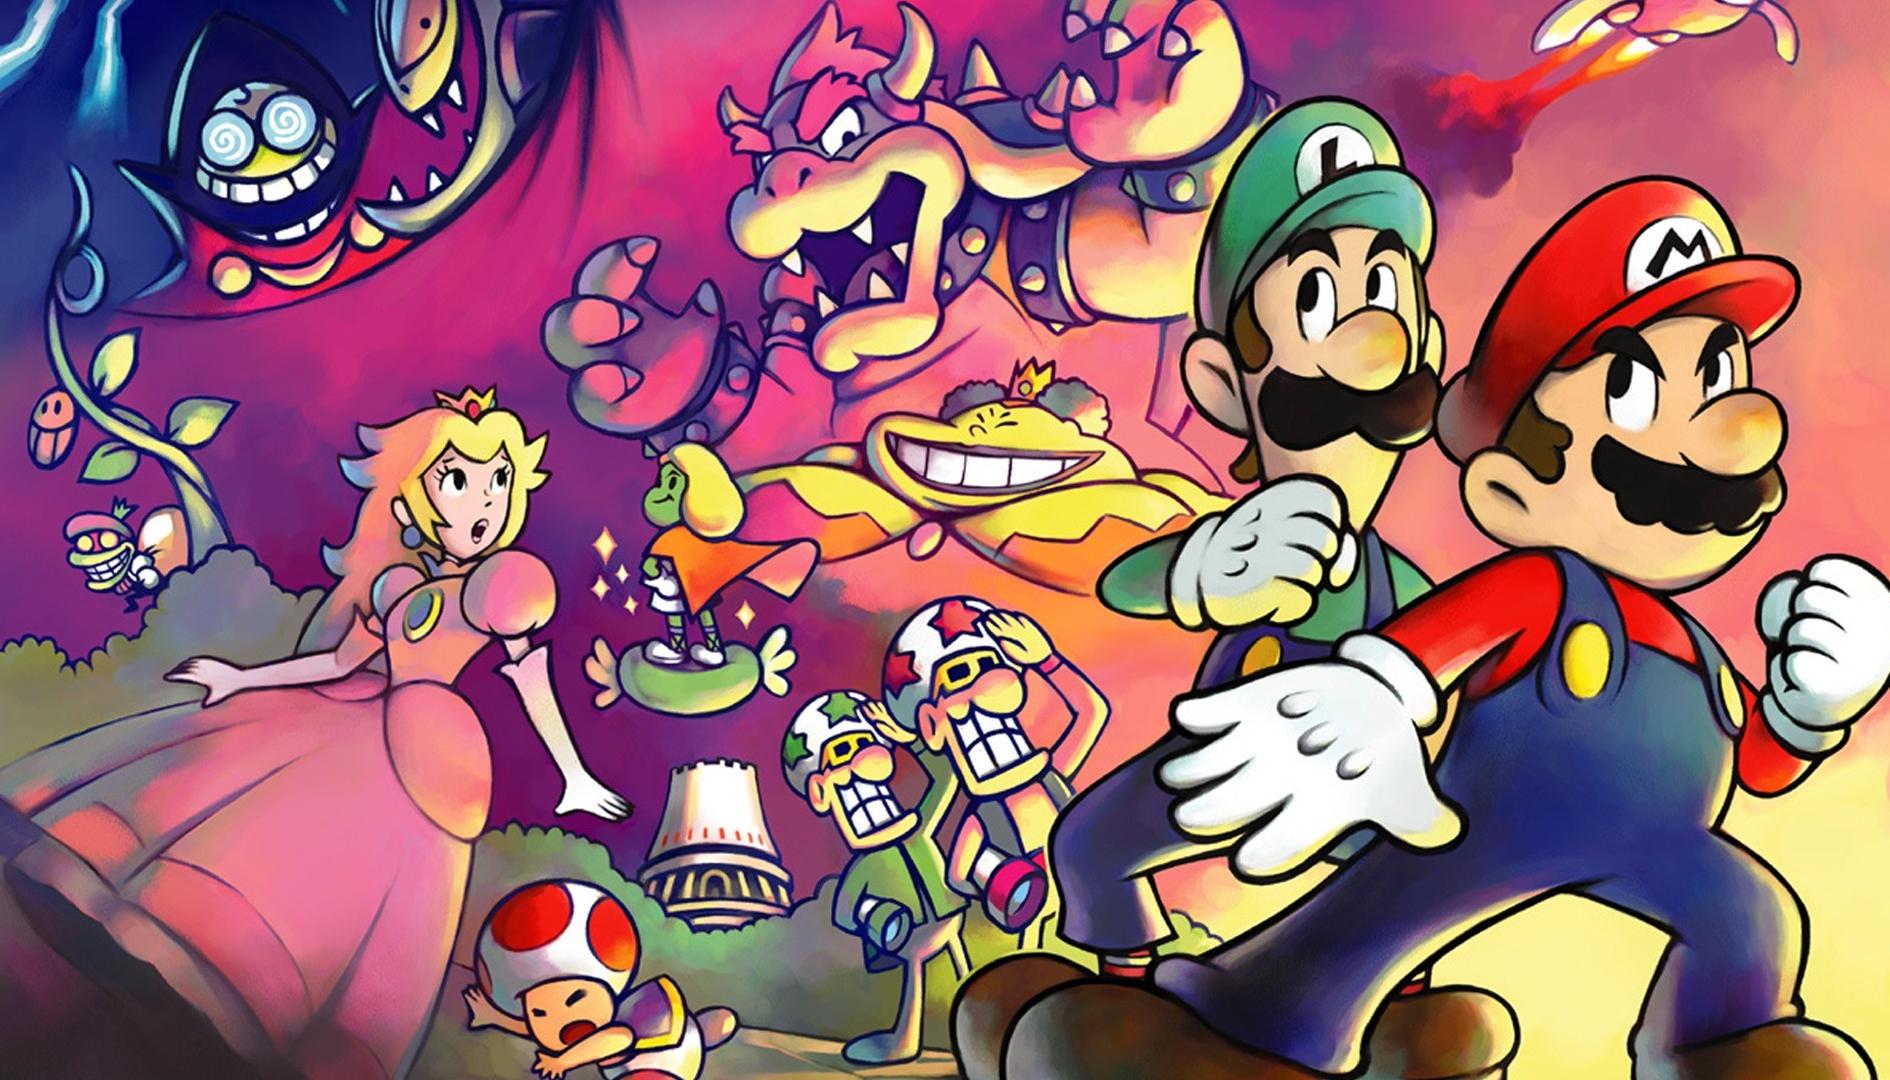 Mario & Luigi, Nintendo è interessata a mantenere la serie